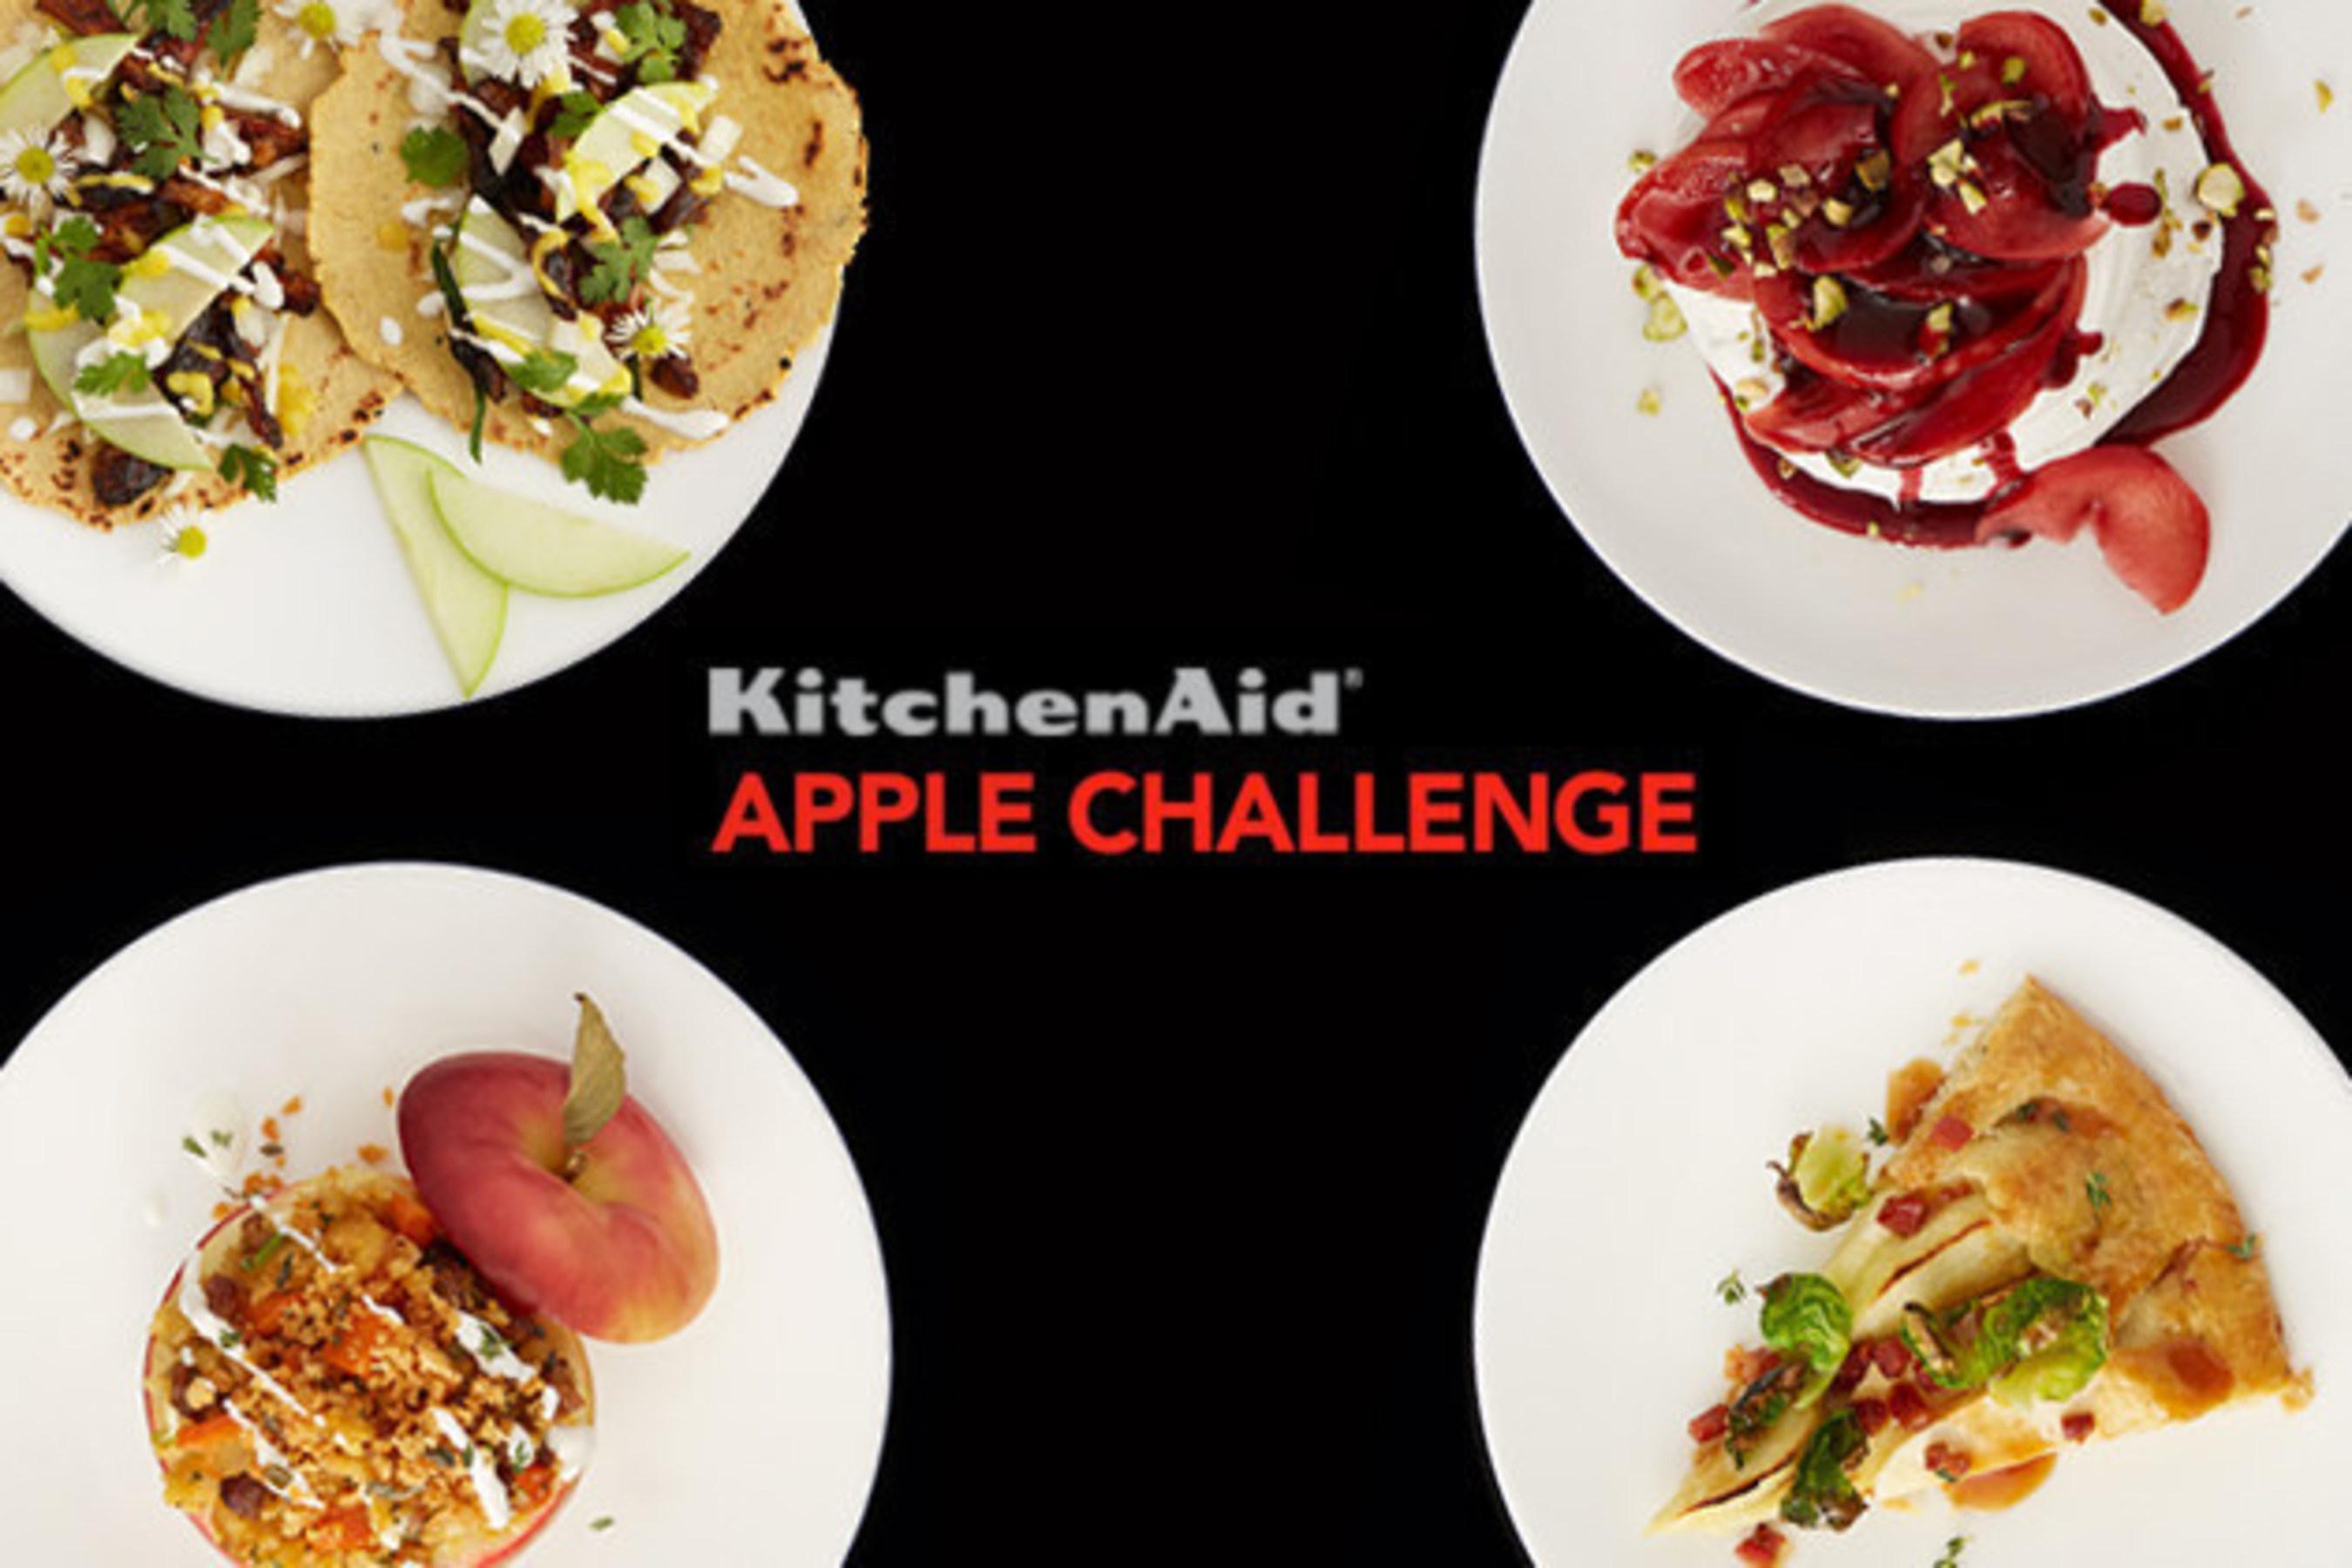 Finalist recipes for the KitchenAid Apple Challenge